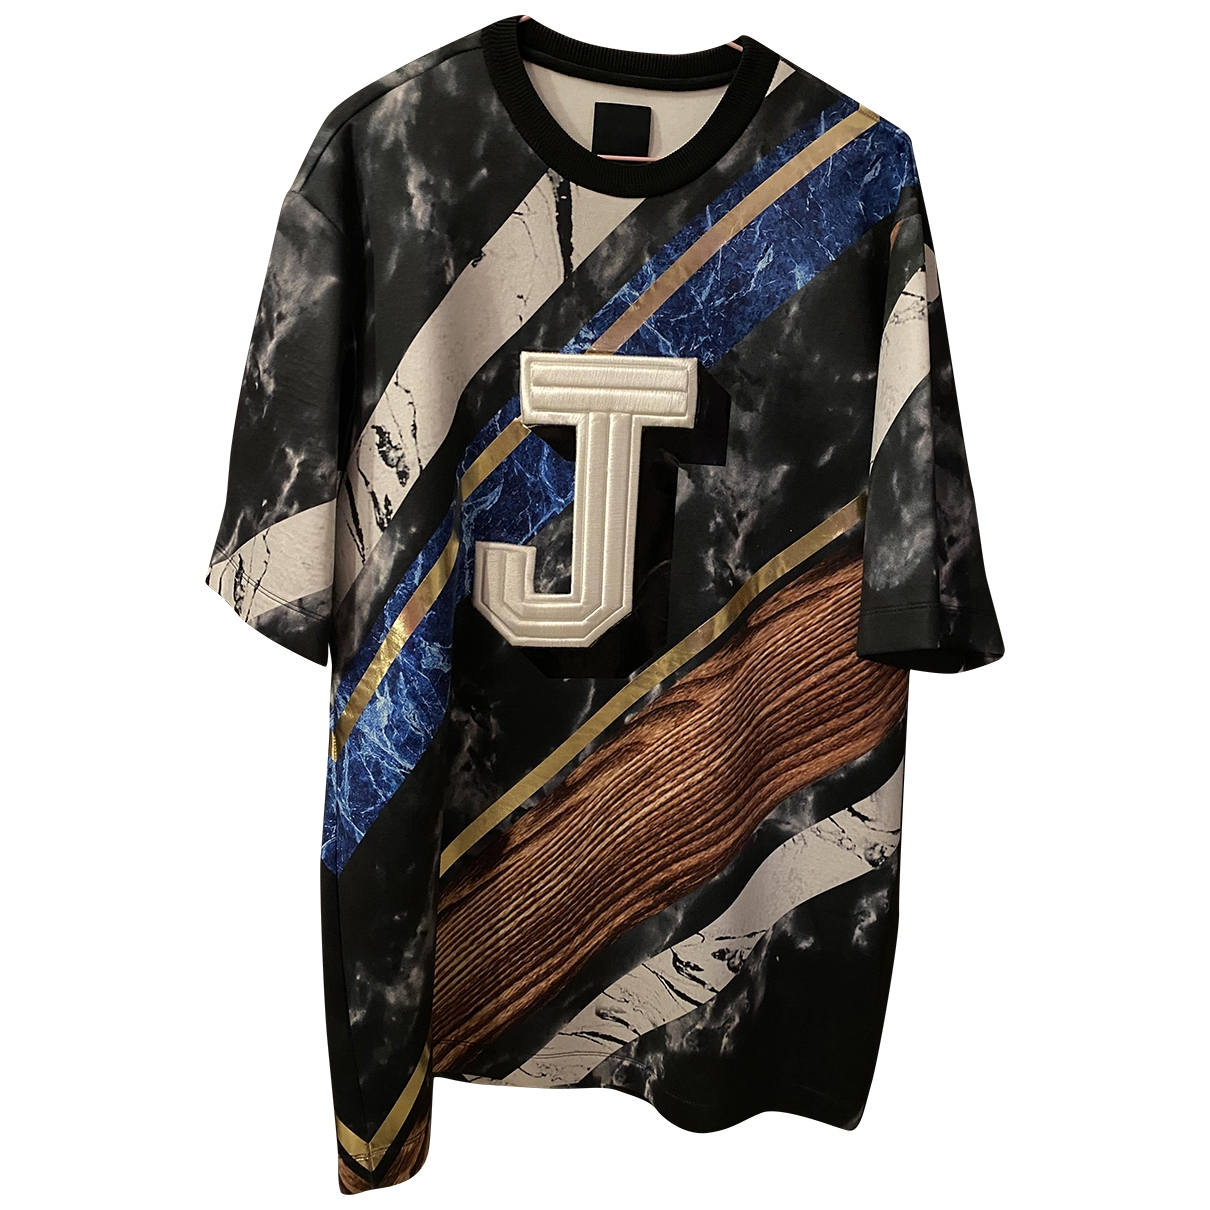 Juunj - Tee shirts   pour homme - multicolore